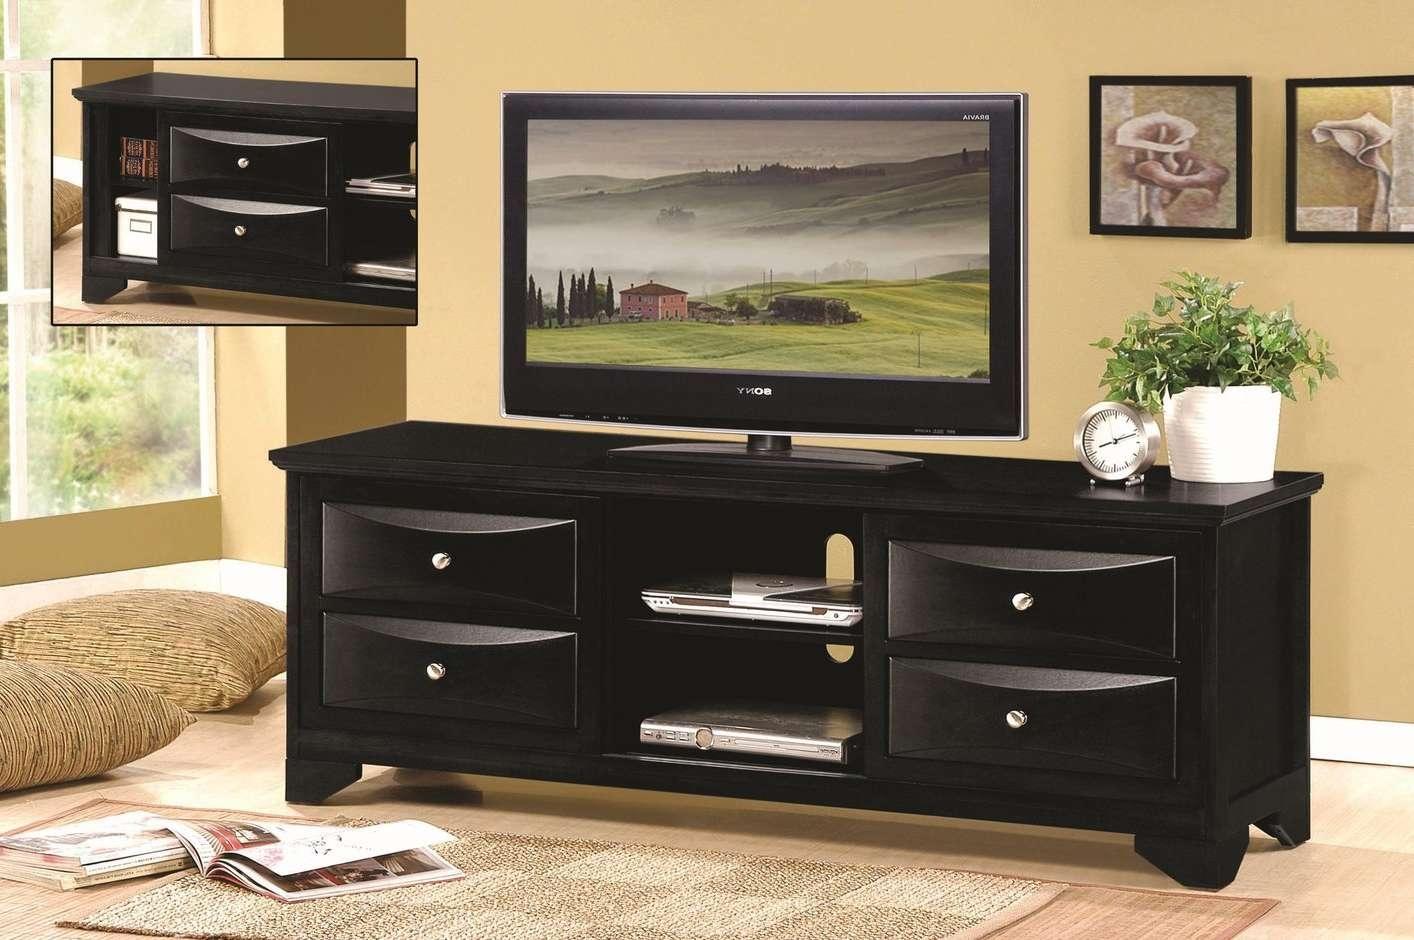 Black Corner Solid Wood Tv Stand Tags : 40 Striking Black Wood Tv For Solid Wood Black Tv Stands (View 5 of 15)